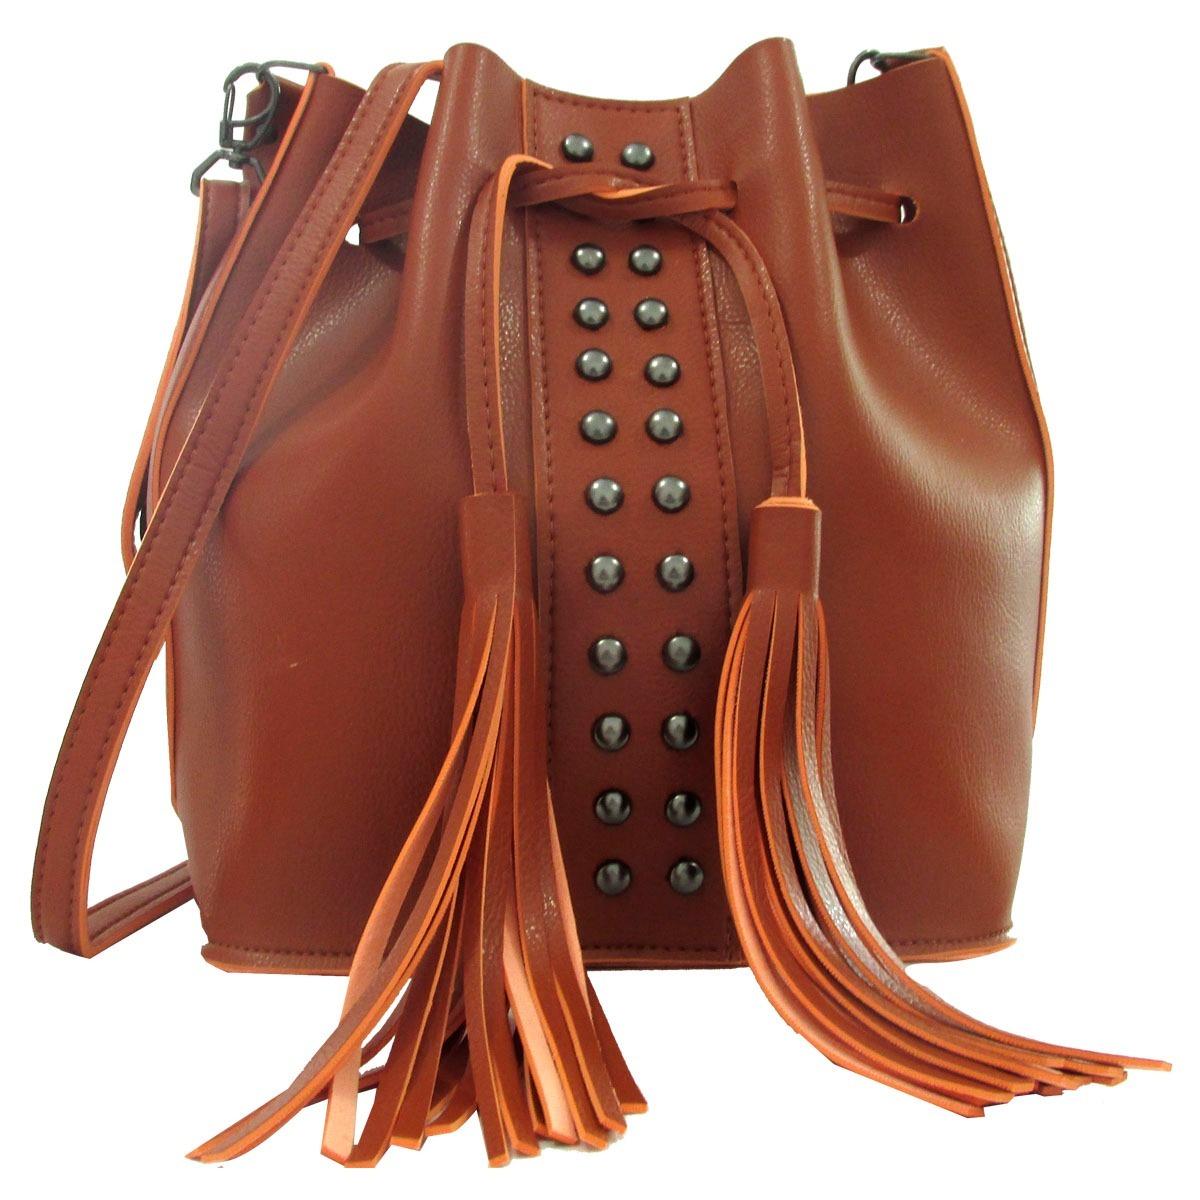 d05956ca1f bolsa transversal feminina modelo bag saco importada. Carregando zoom.